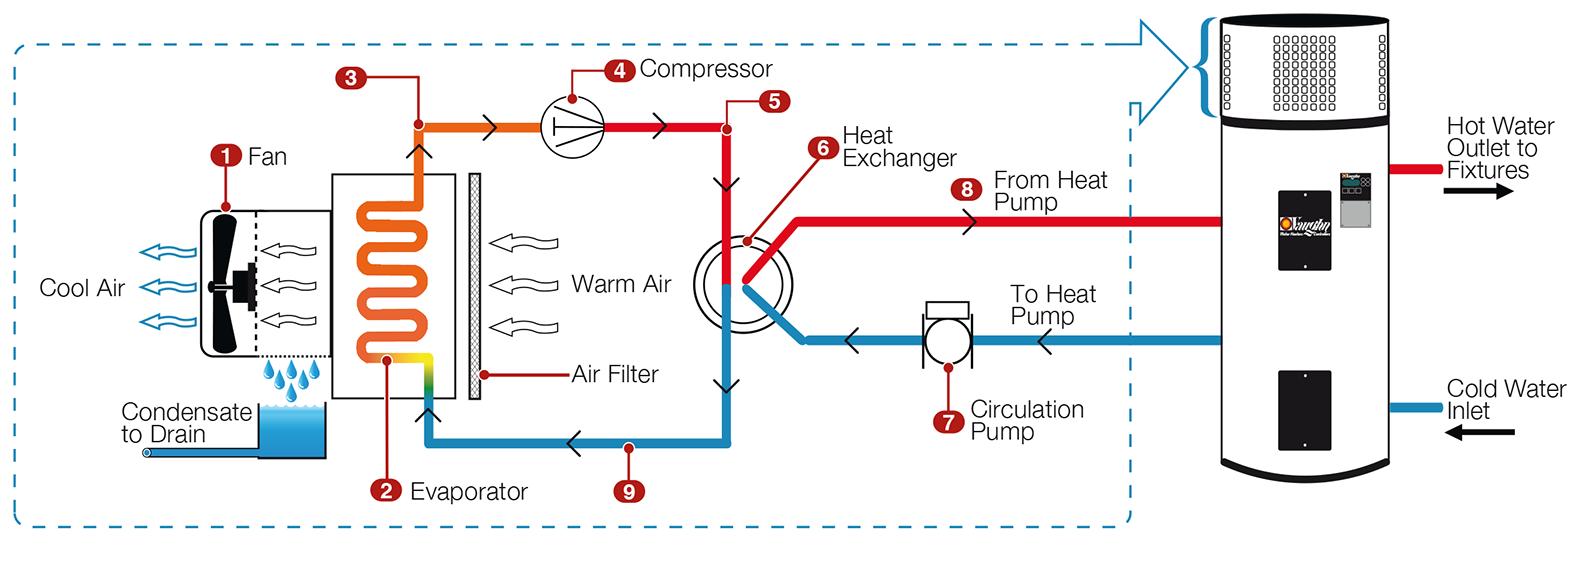 Electric Hot Water Tank Wiring Diagram Webtor Me Inside Coachedby Best Of